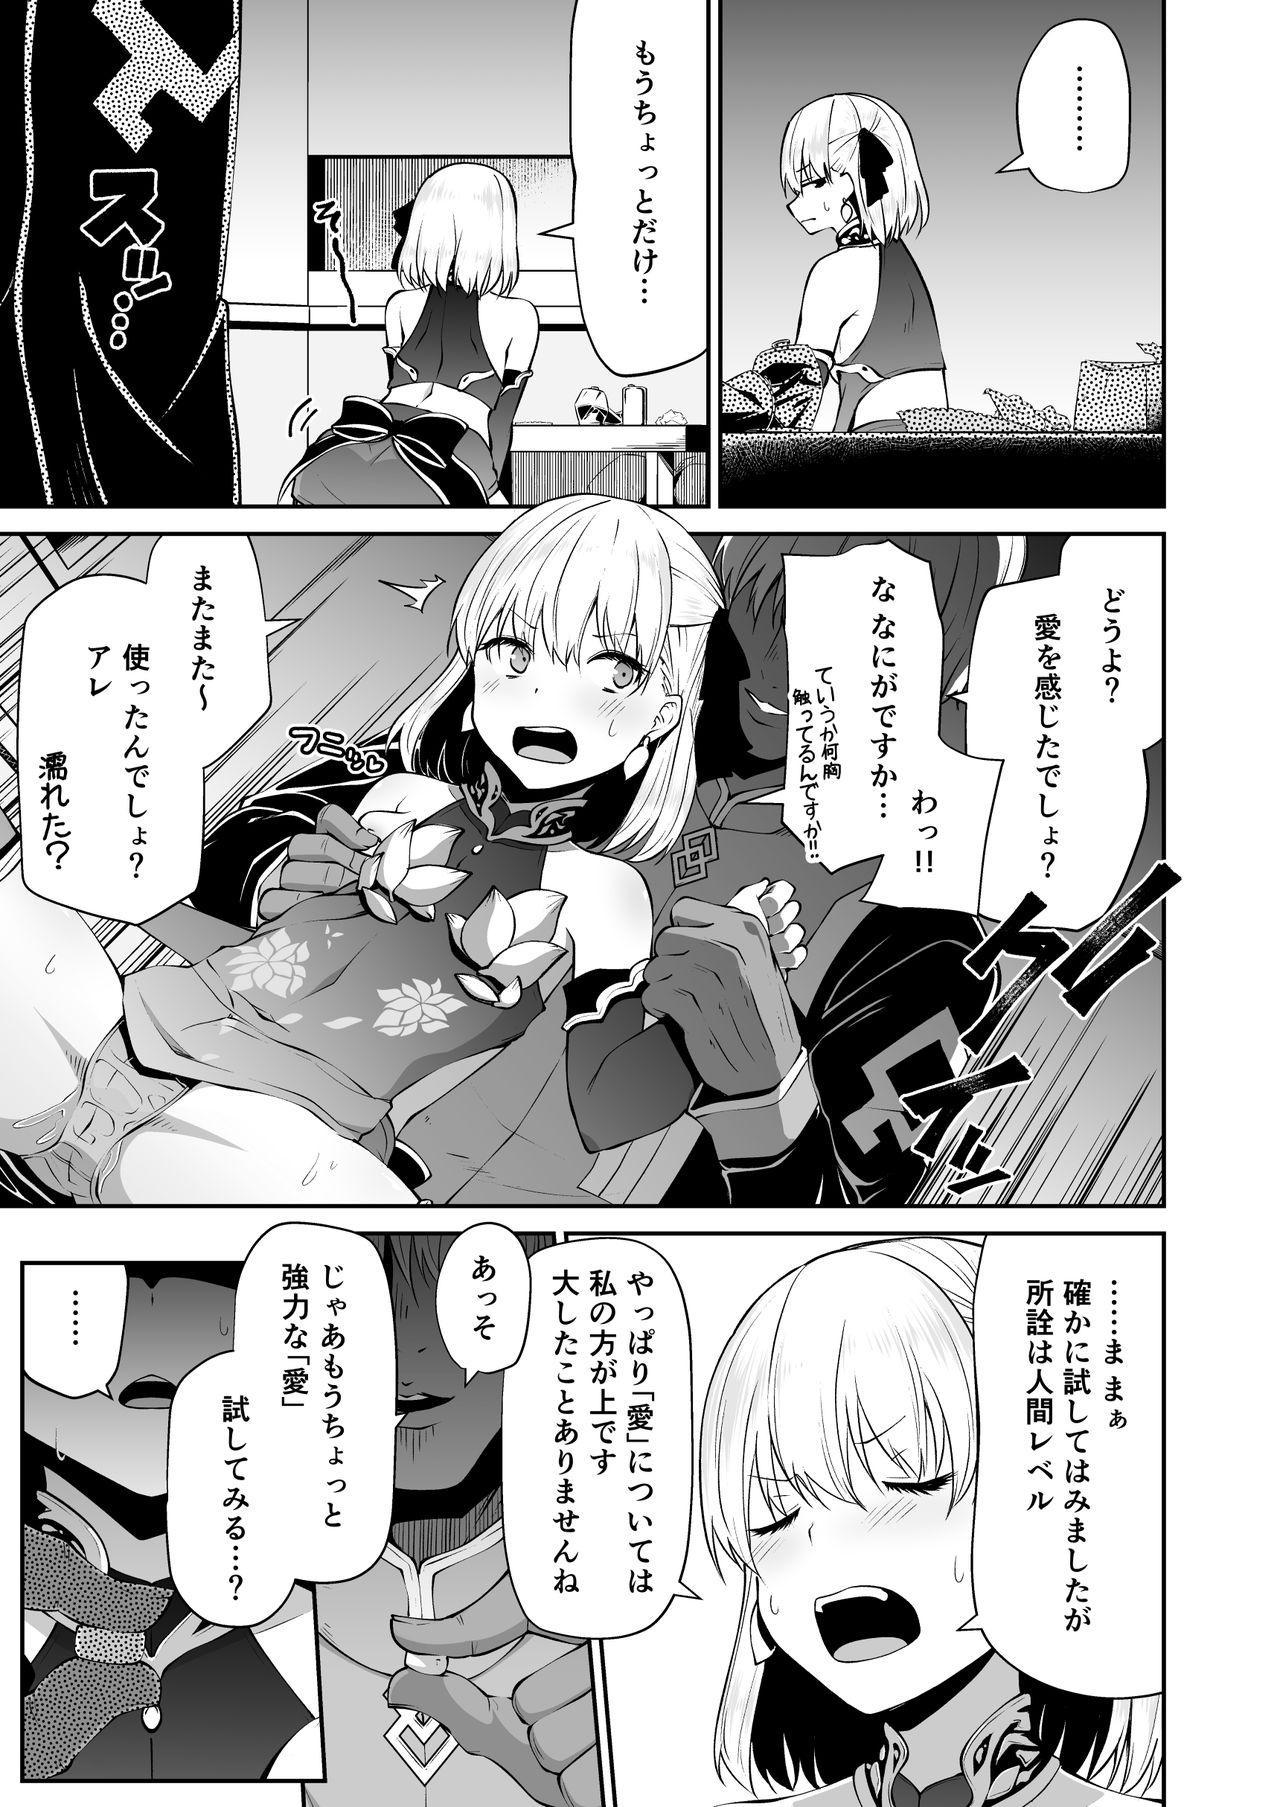 [Kitsuneya (Leafy)] Kama-chan to Love-prescription (Fate/Grand Order) [Digital] 10